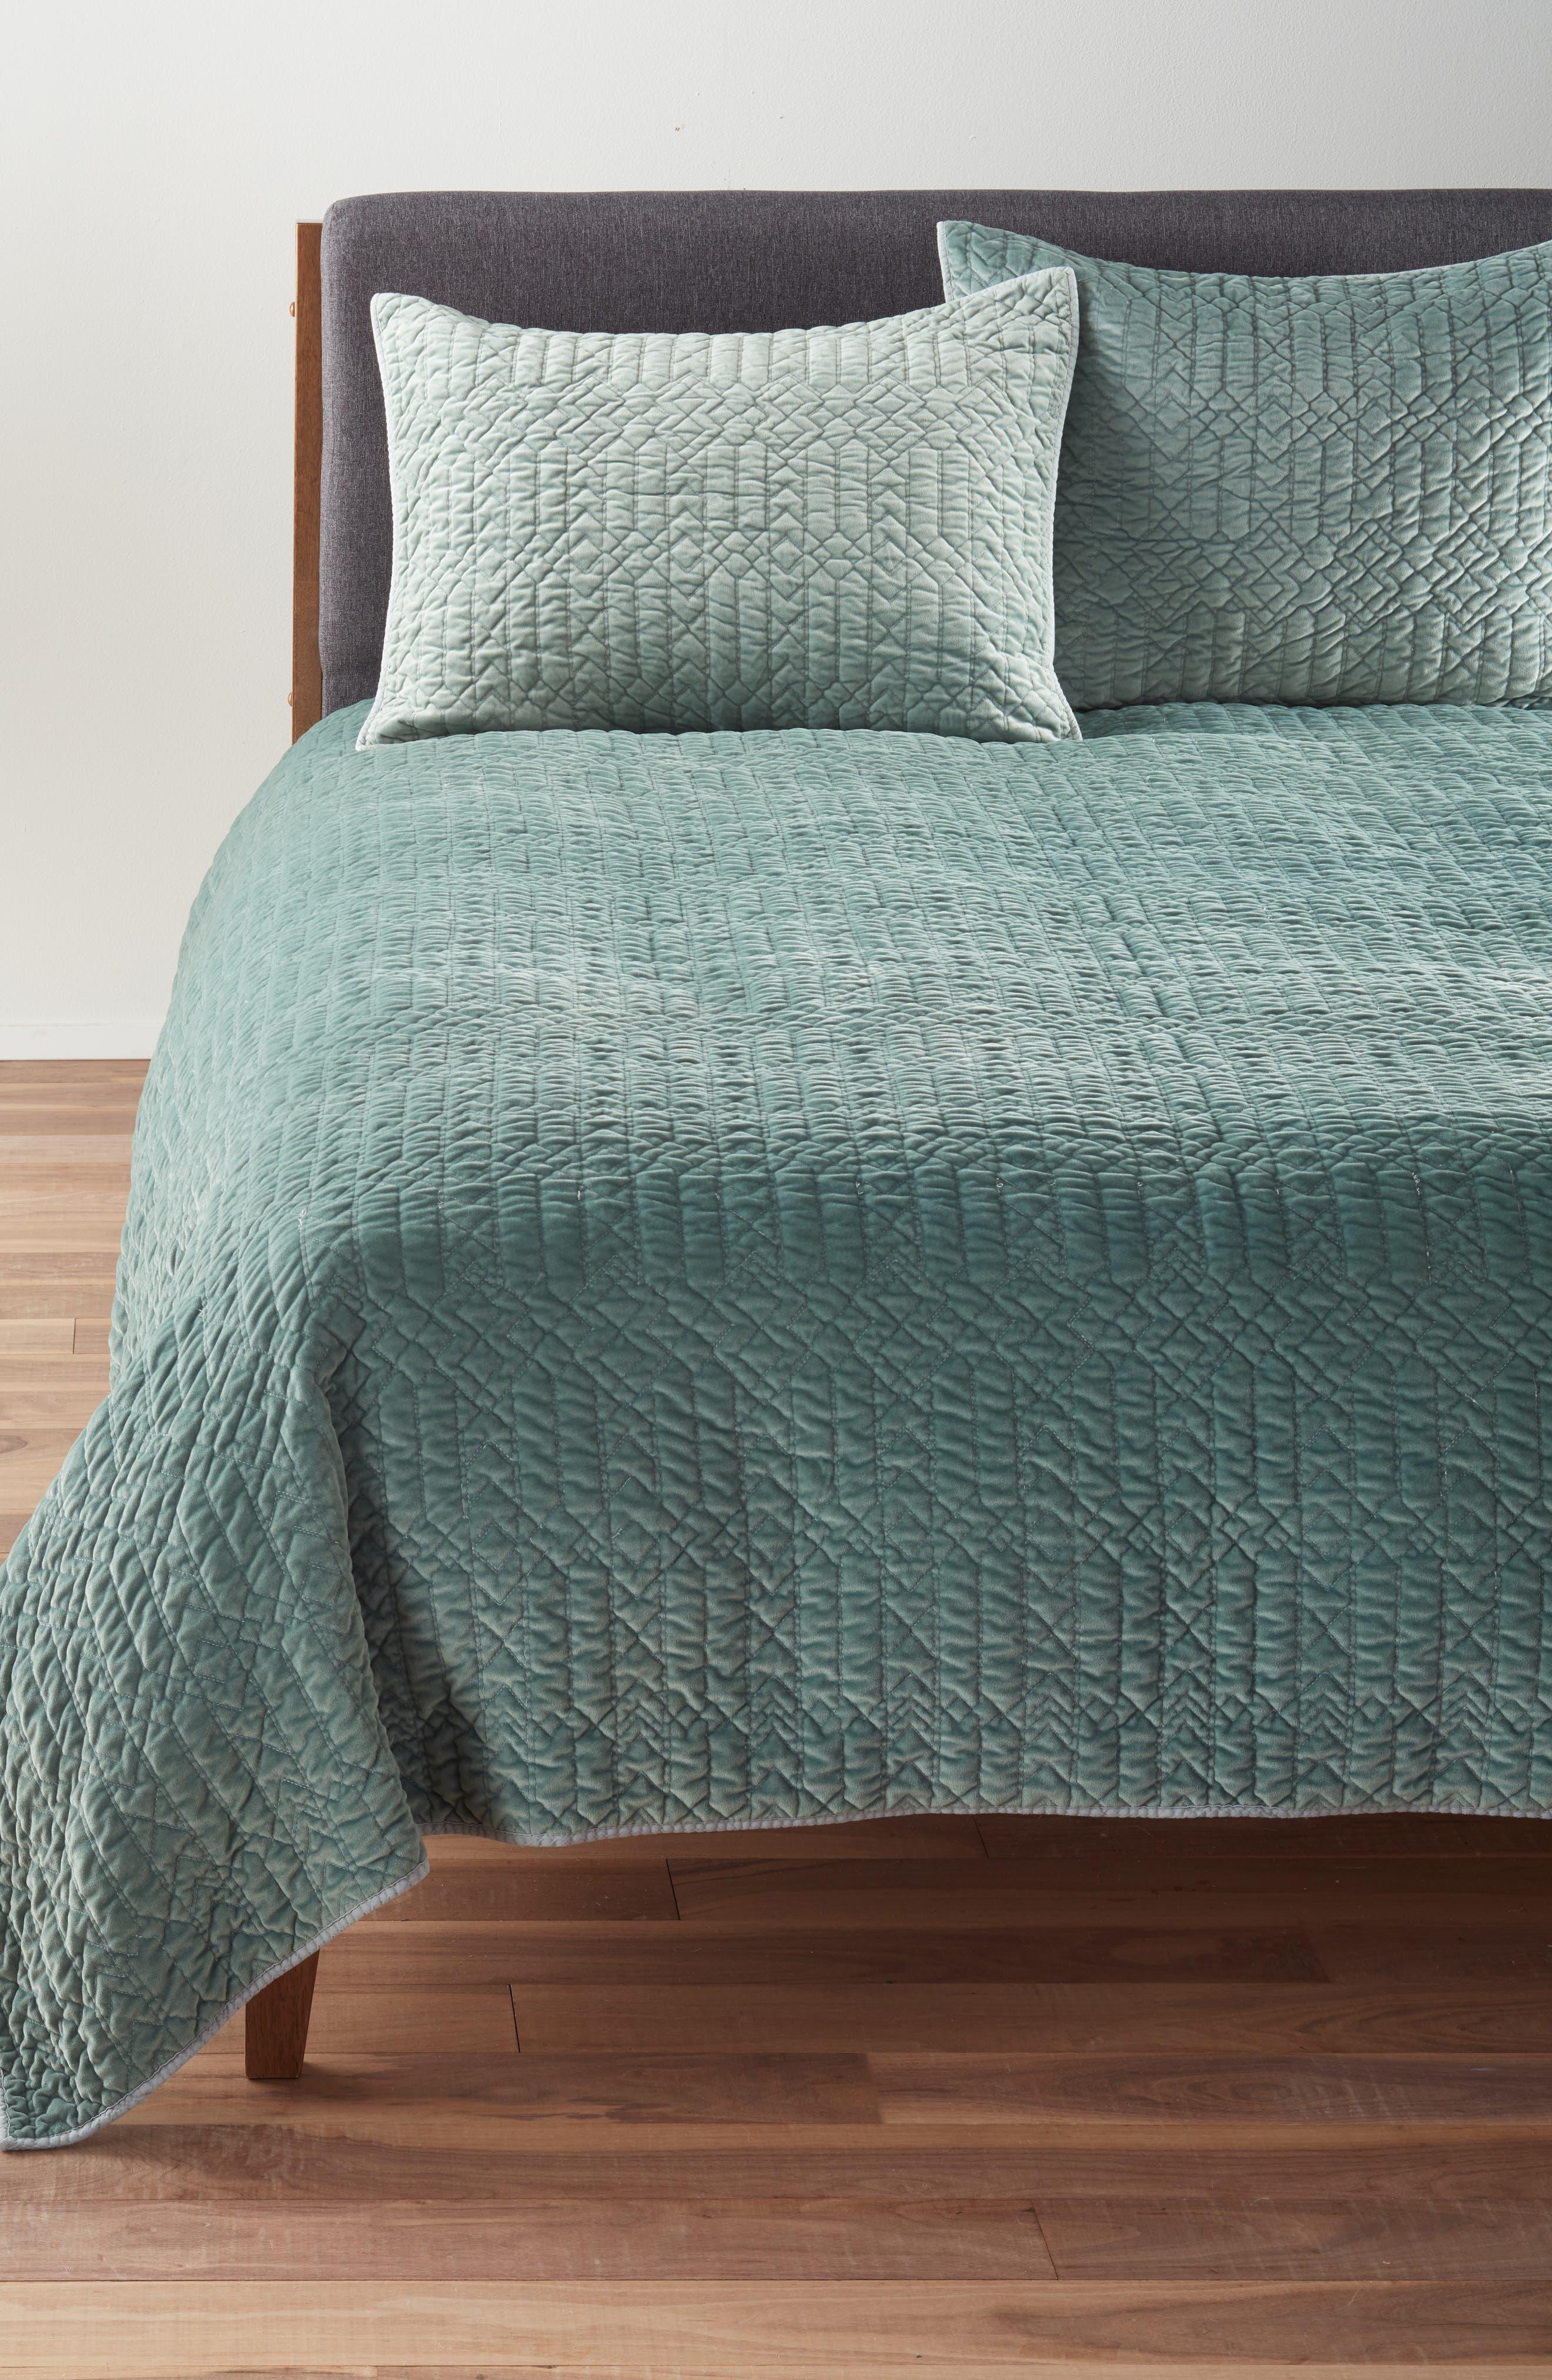 NORDSTROM AT HOME,                             Washed Velvet Quilt,                             Main thumbnail 1, color,                             300